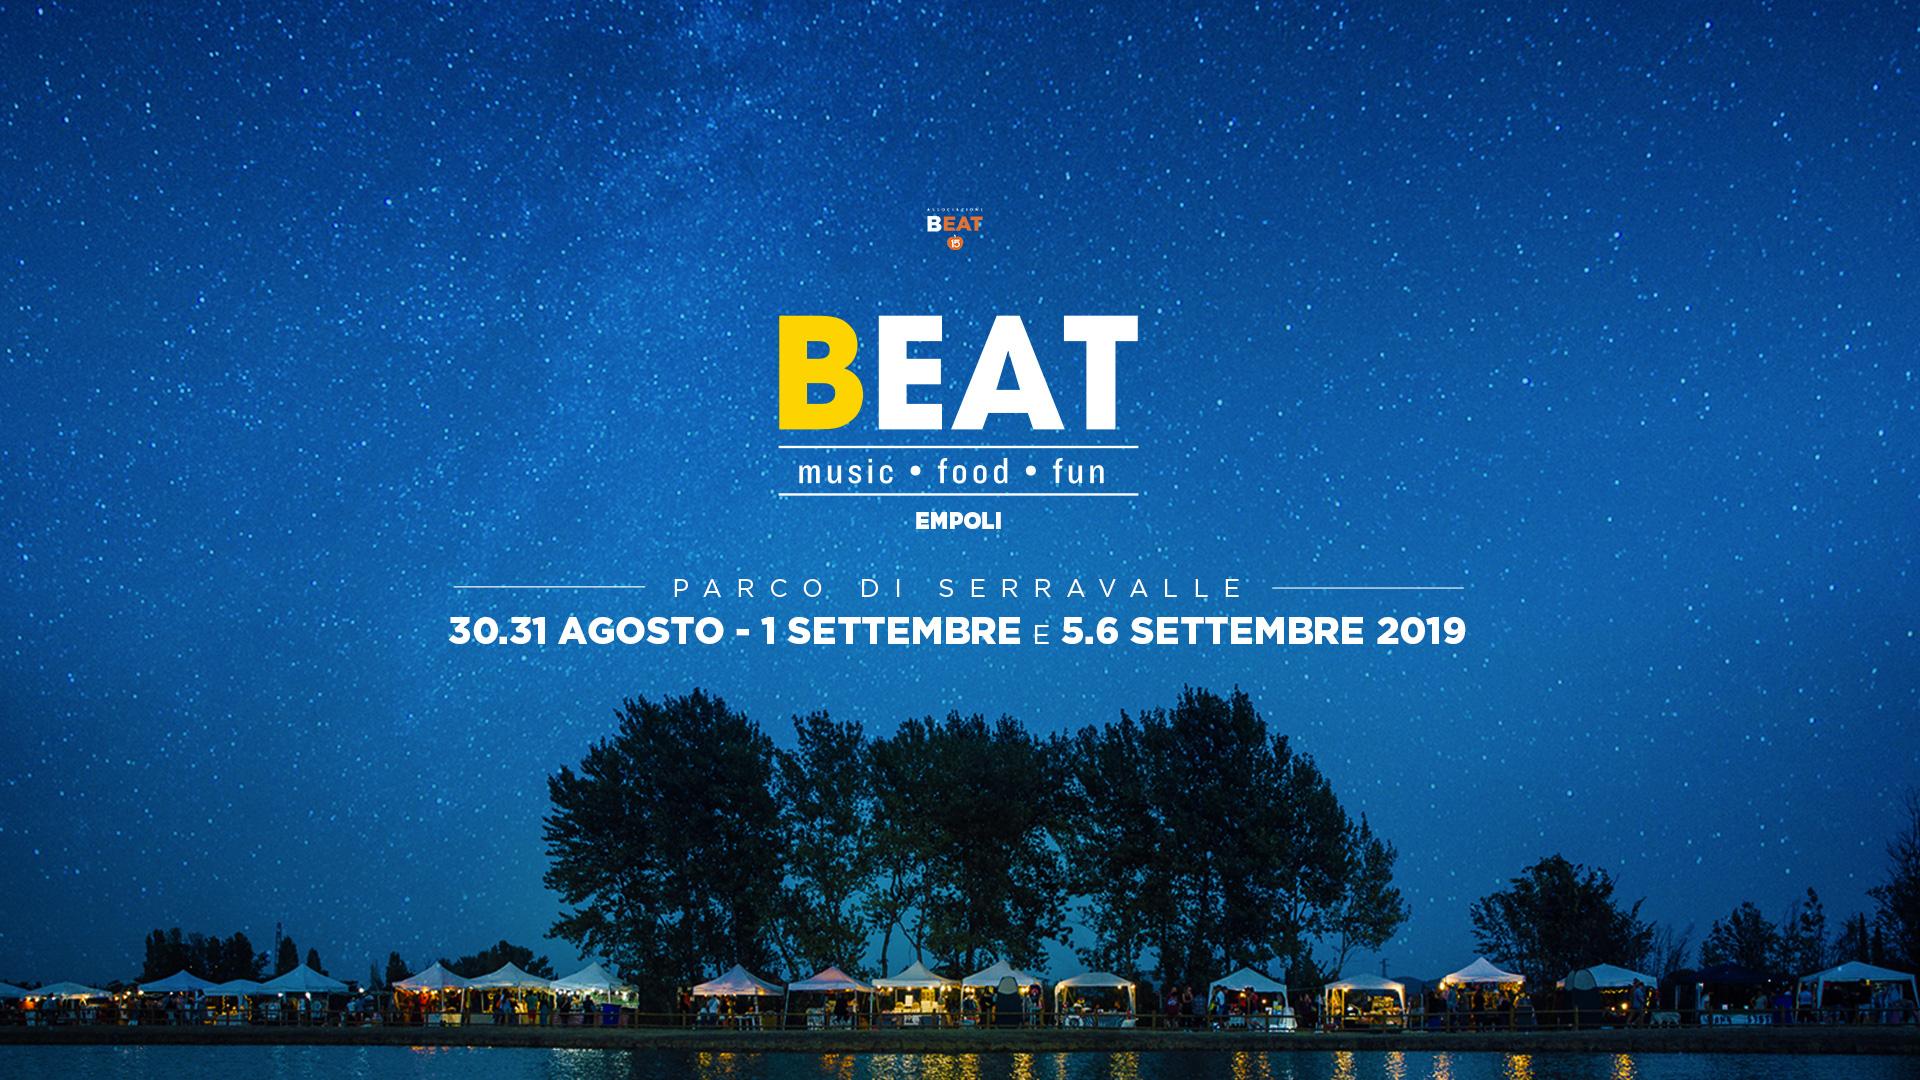 Beat Festival Empoli 2019